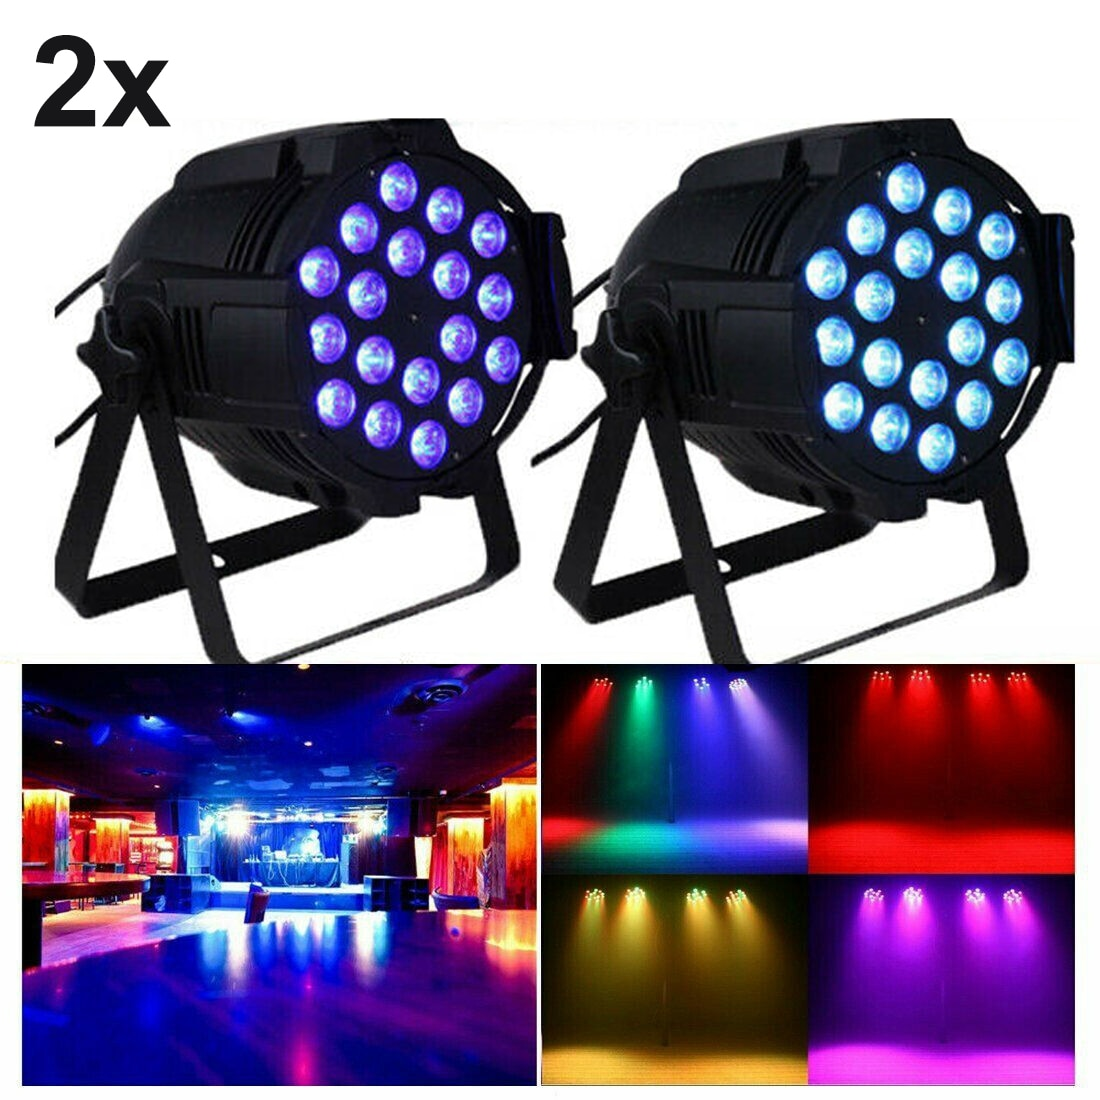 Honhill 2pcs 4 IN 1 PAR LED Light RGBW Stage Beam Lights DMX Party DJ Strobe Effect Party Show